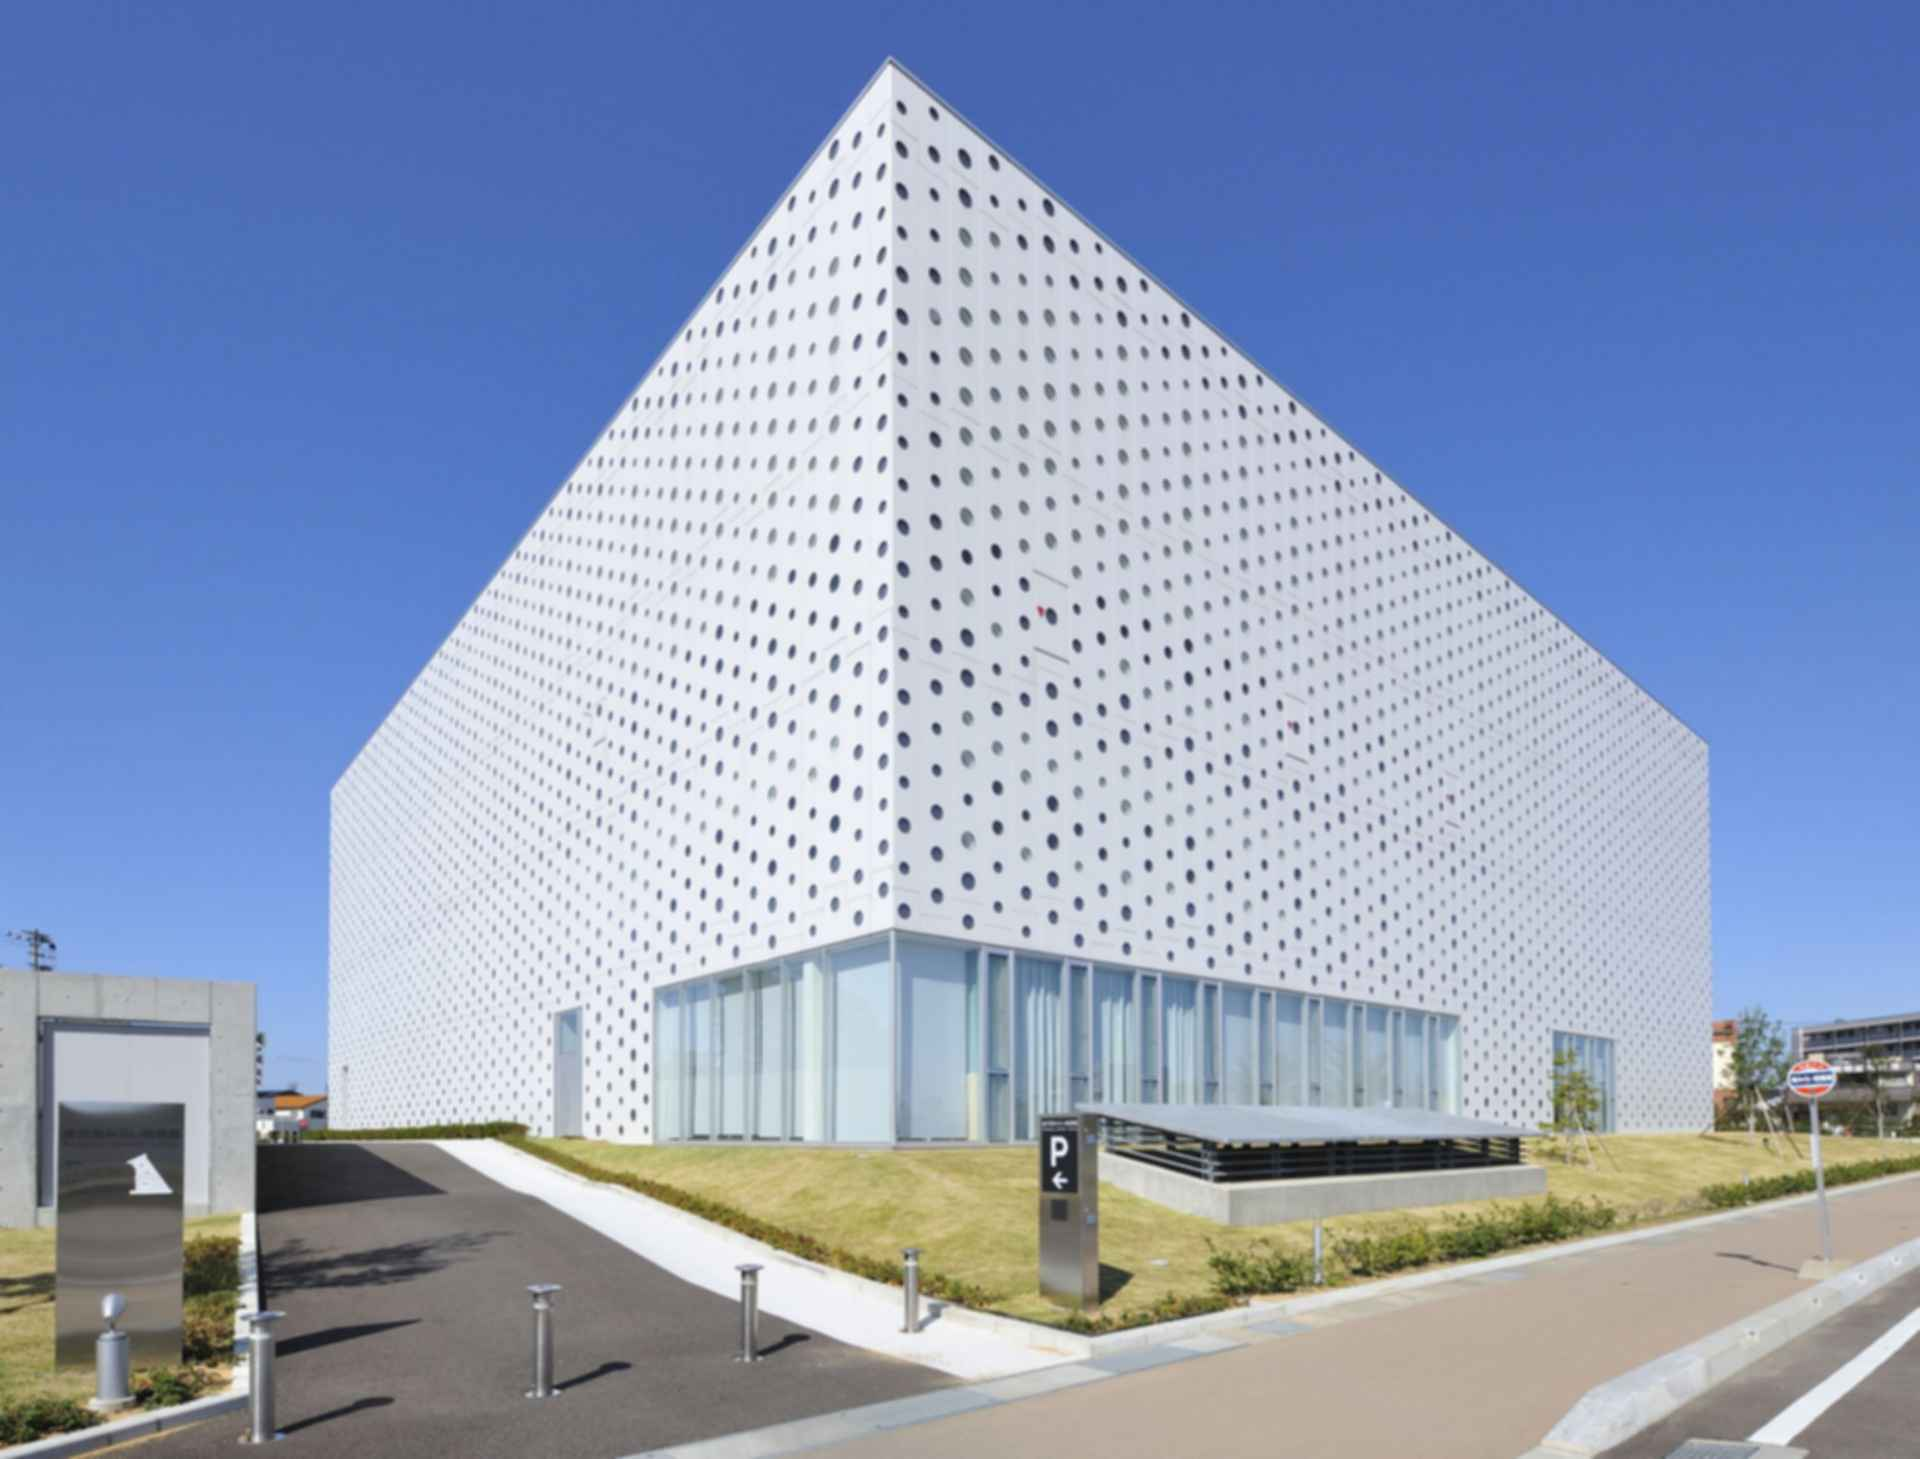 Kanazawa Umimirai Library - Exterior